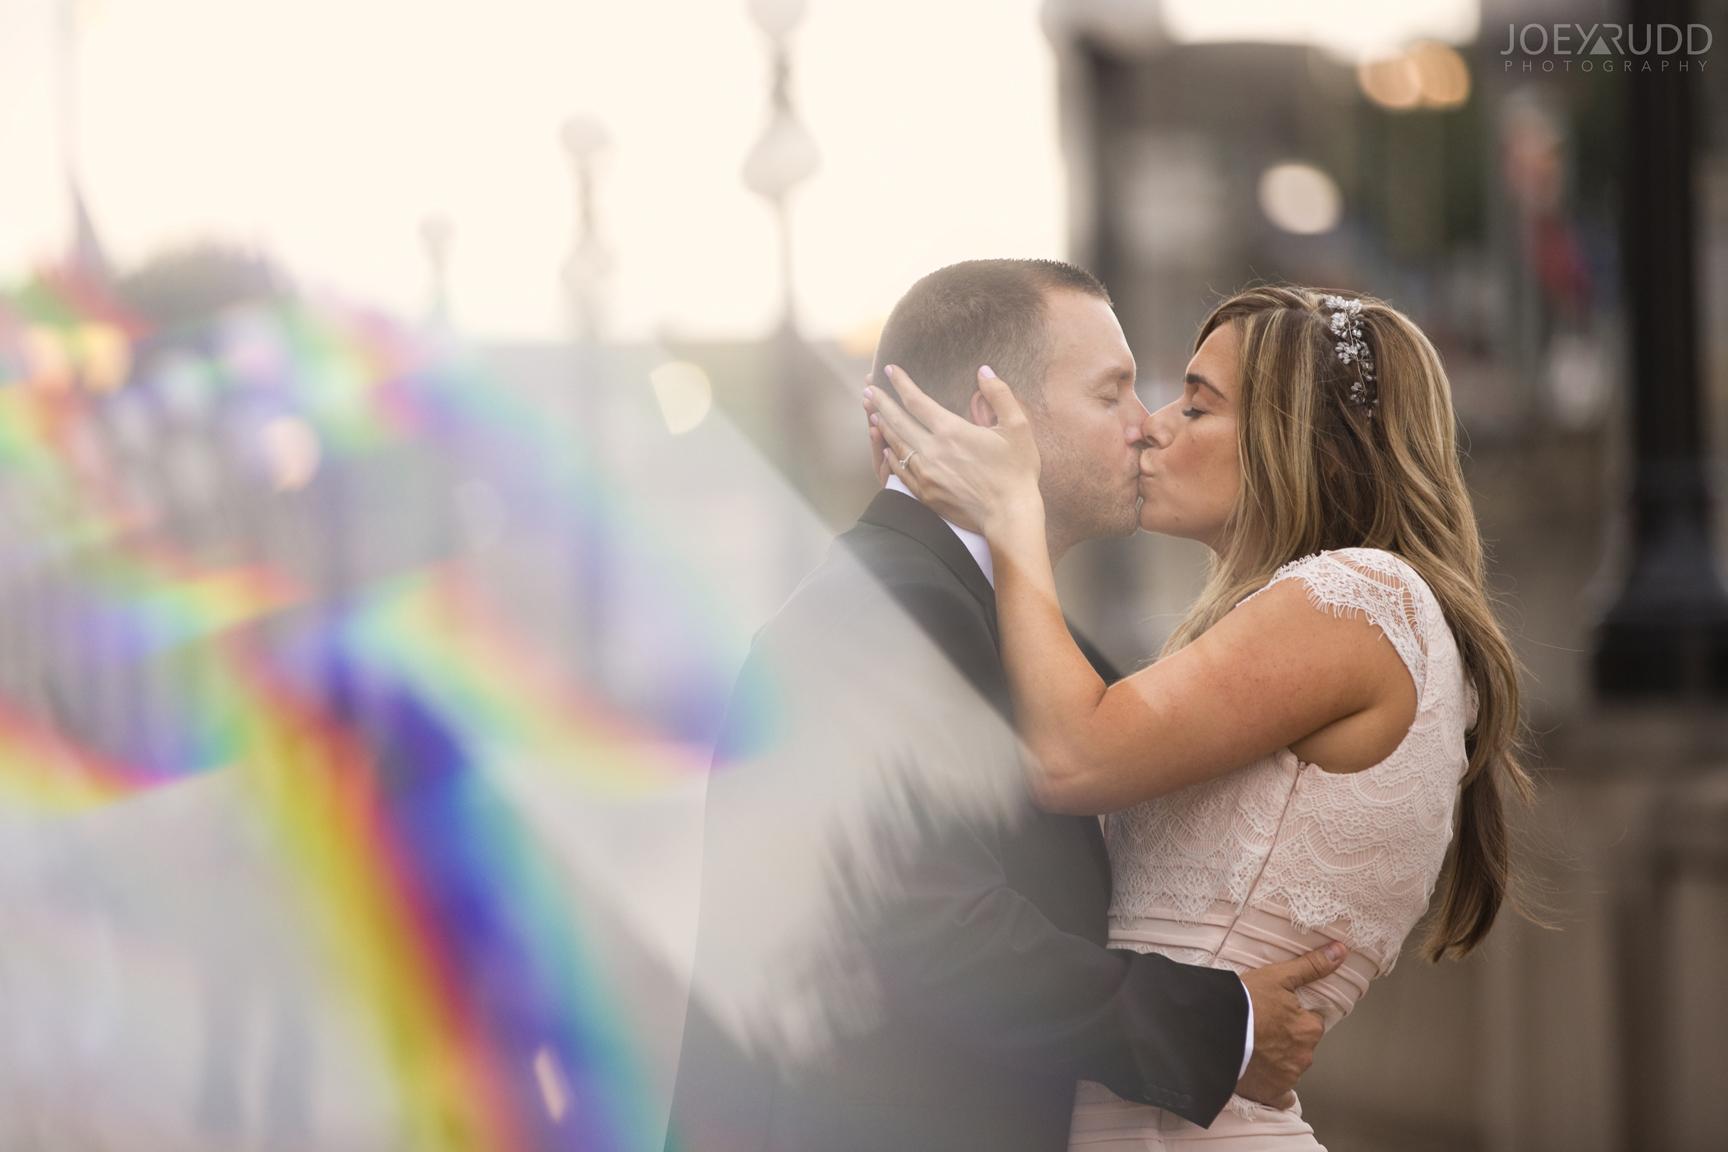 Elopement Wedding by Ottawa Wedding Photographer Joey Rudd Photography Majors Hill Prisming